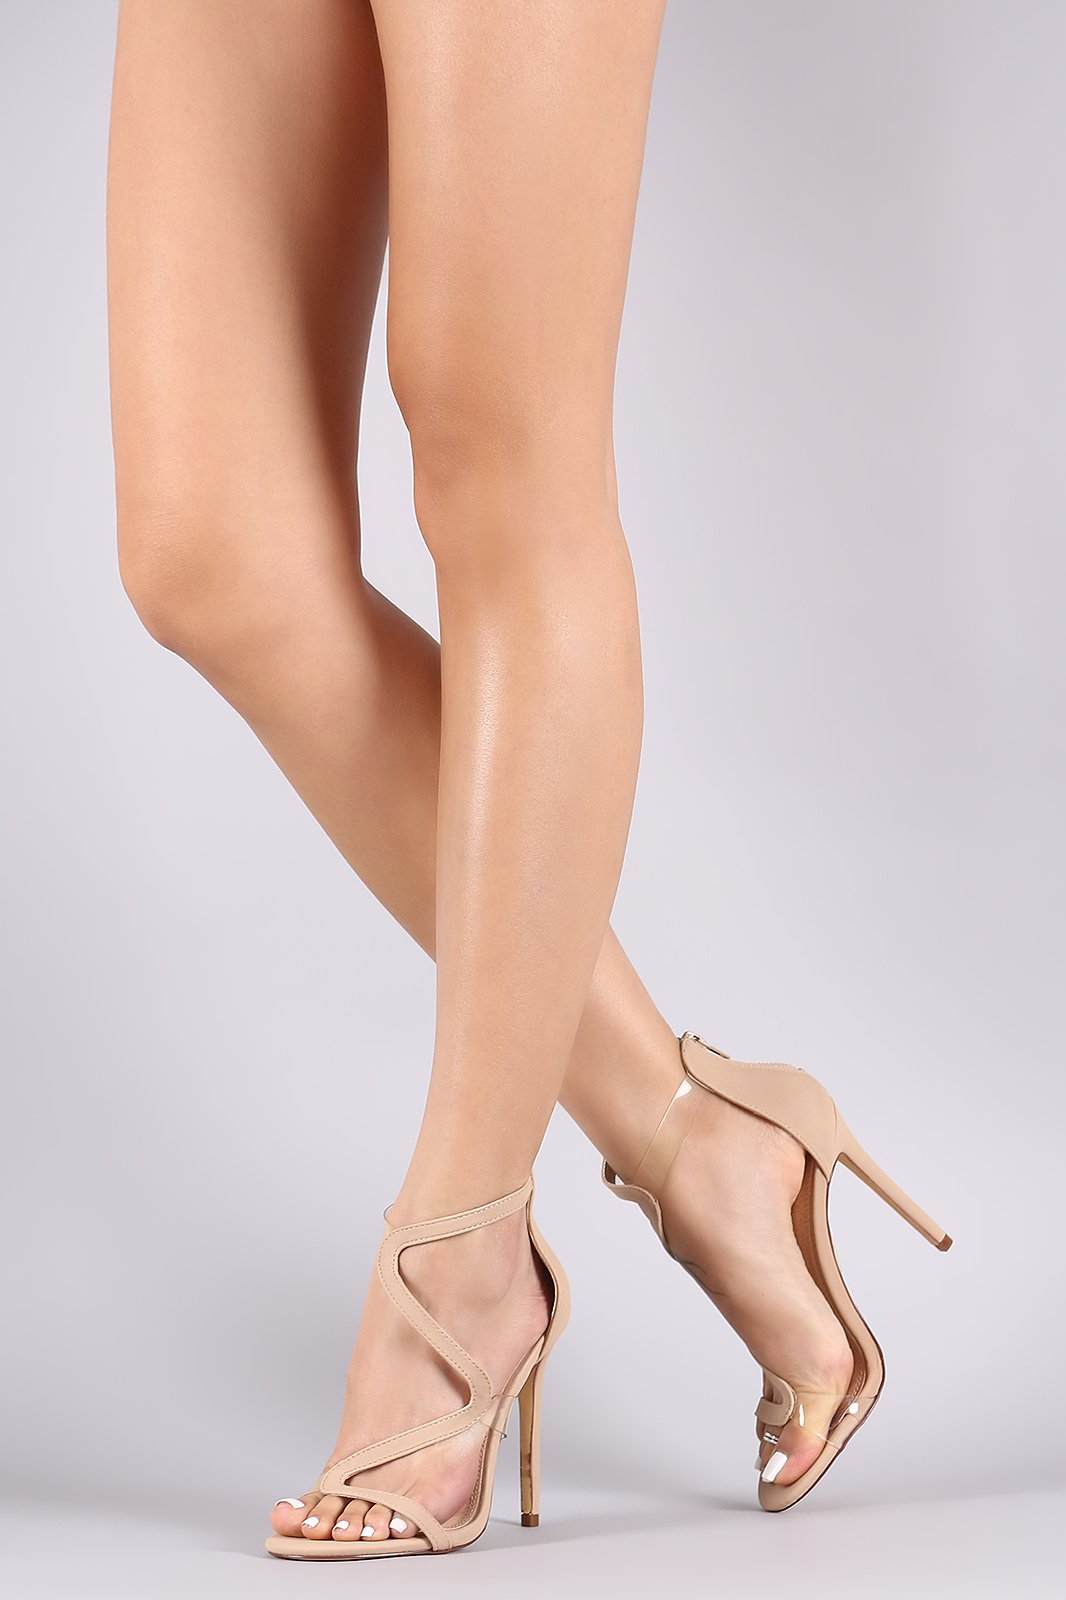 Liliana Asymmetrical Clear Strap Stiletto Heel Сумки